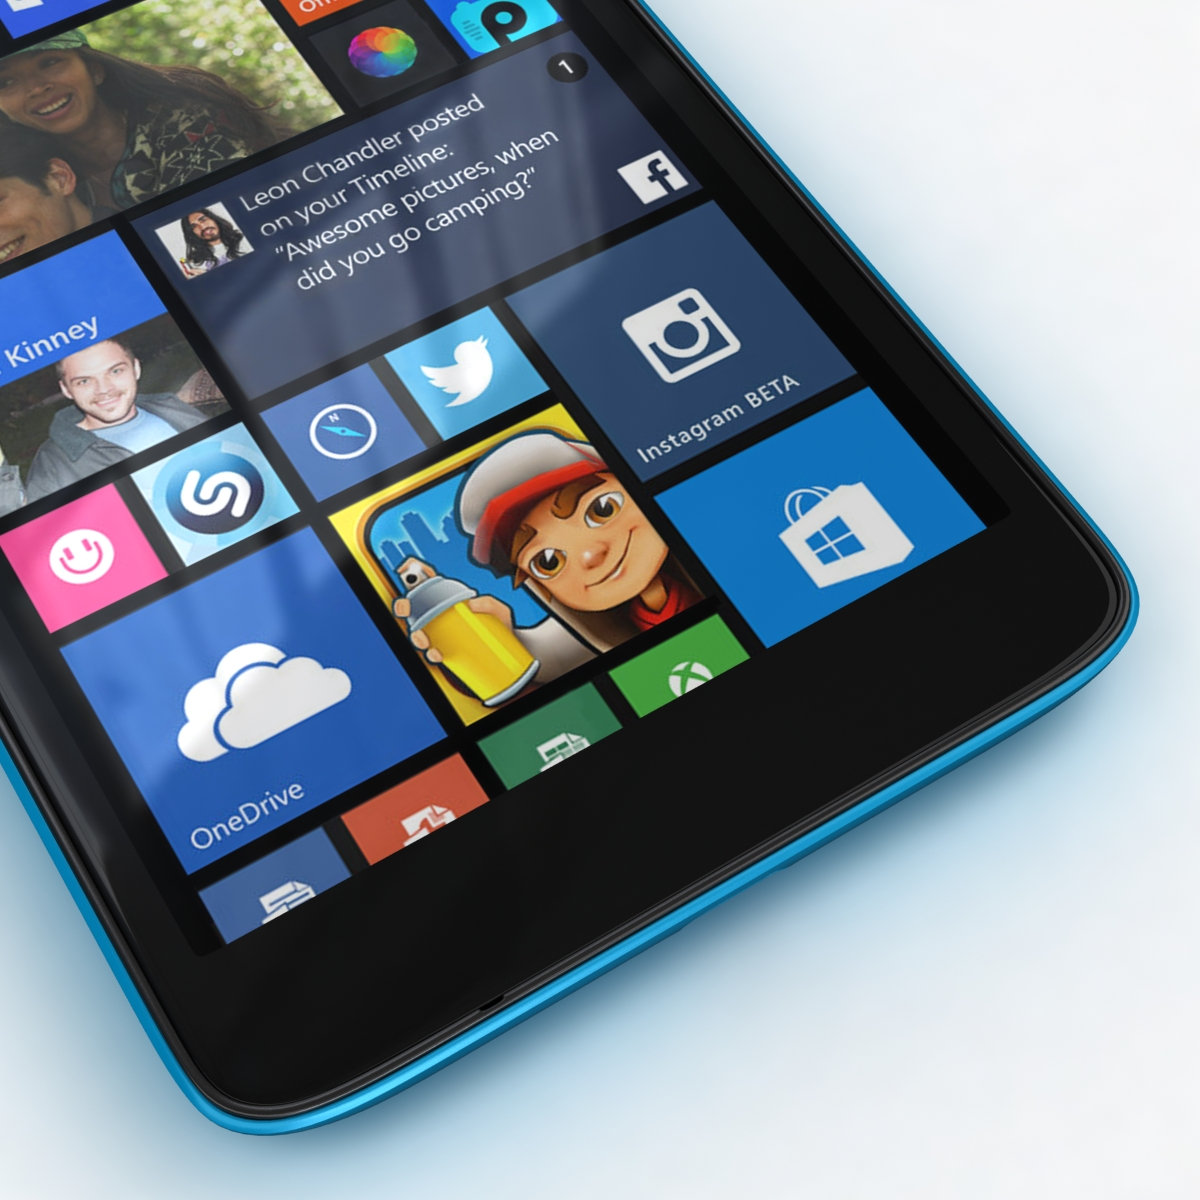 microsoft lumia 535 and dual sim blue 3d model 3ds max fbx c4d obj 204525